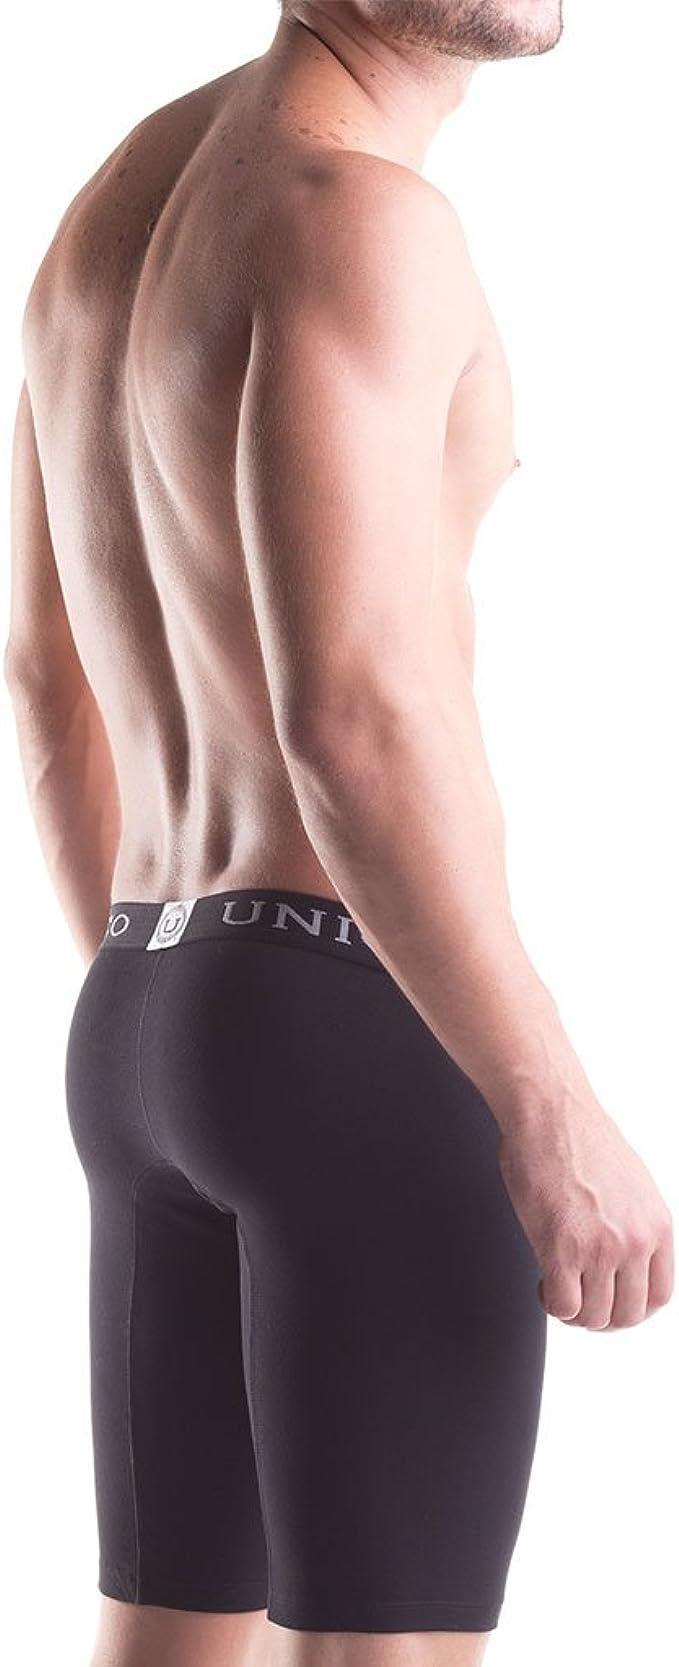 Unico Boxer Xtra Long Leg Athletic CRISTALINO Cotton